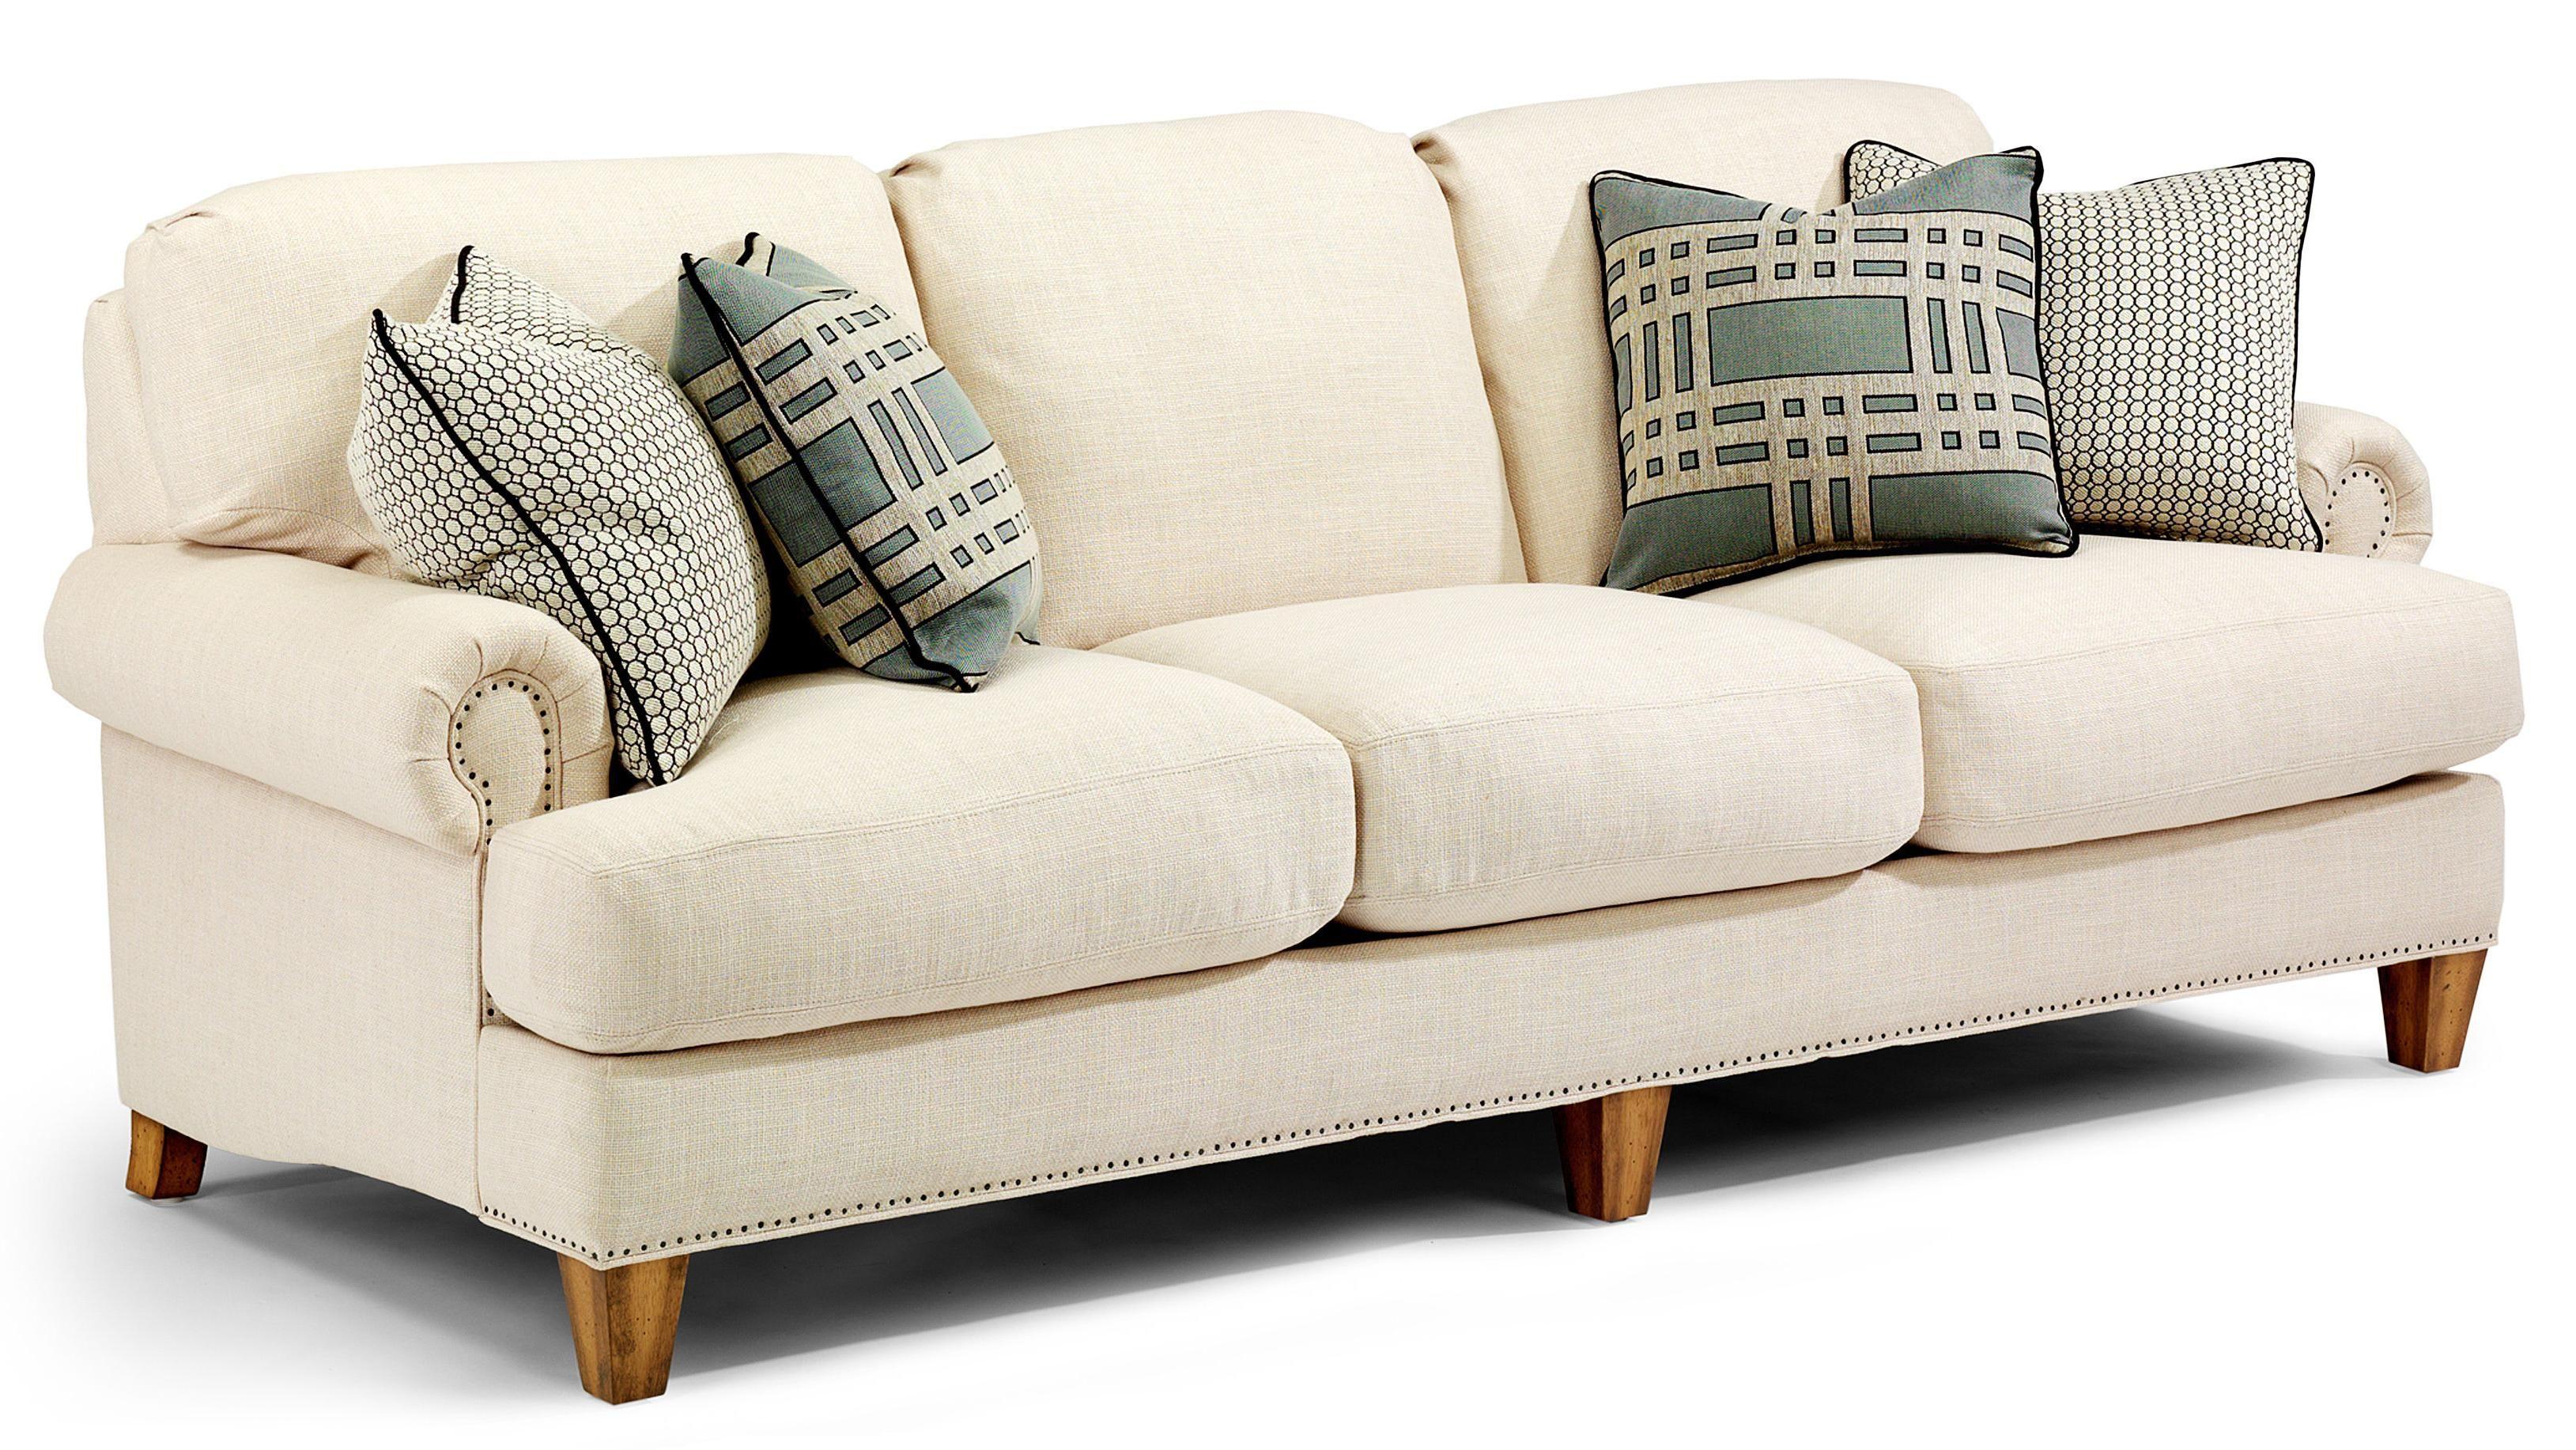 flexsteel bexley sofa bed rental flex steel holly frontroom furnishings